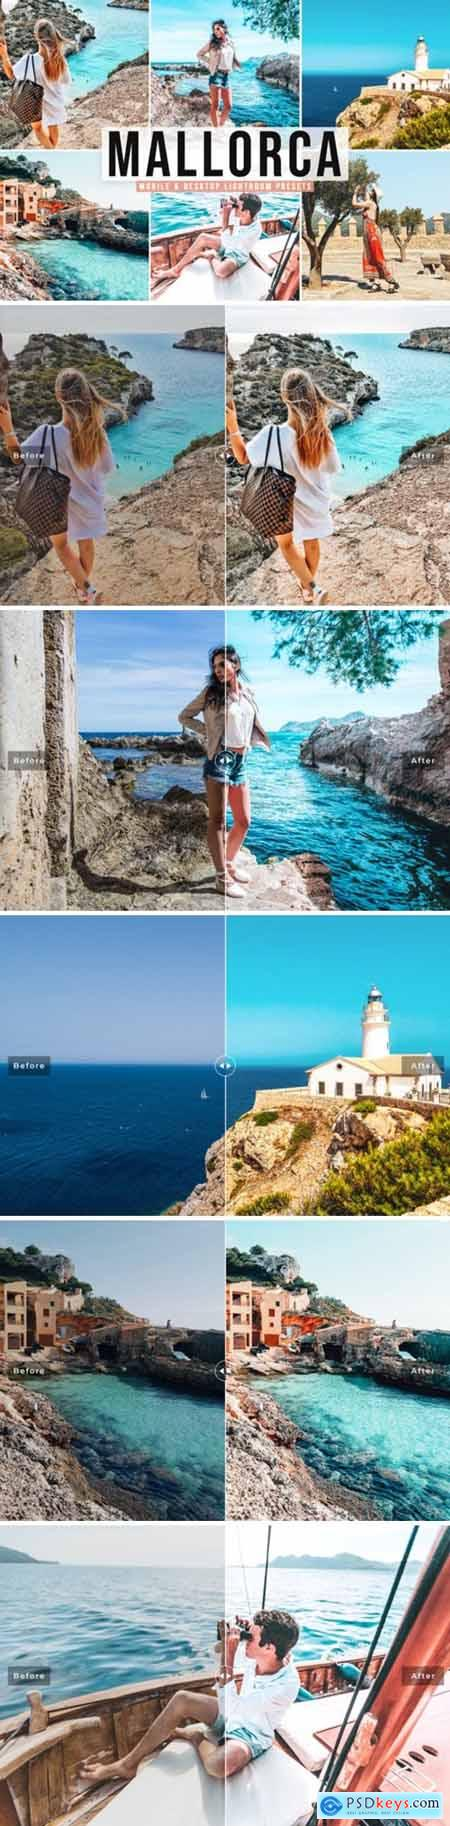 Mallorca Pro Lightroom Presets 7880477